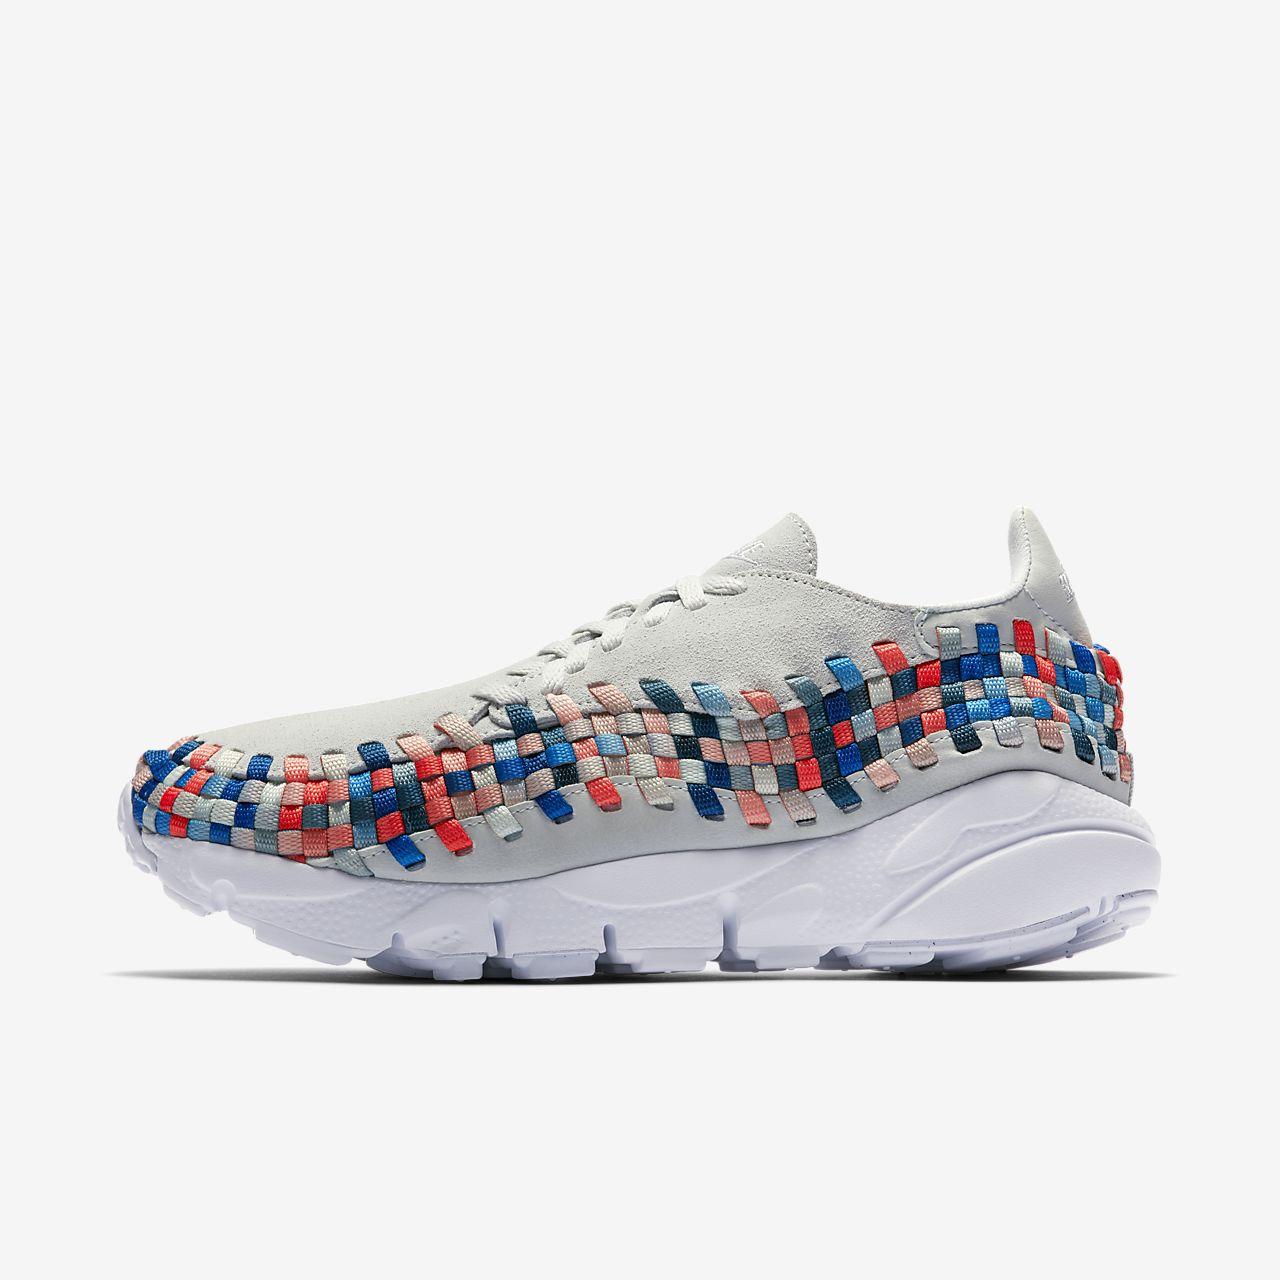 low priced 4b28b da908 ... where can i buy nike air footscape woven womens shoe 424c7 38193